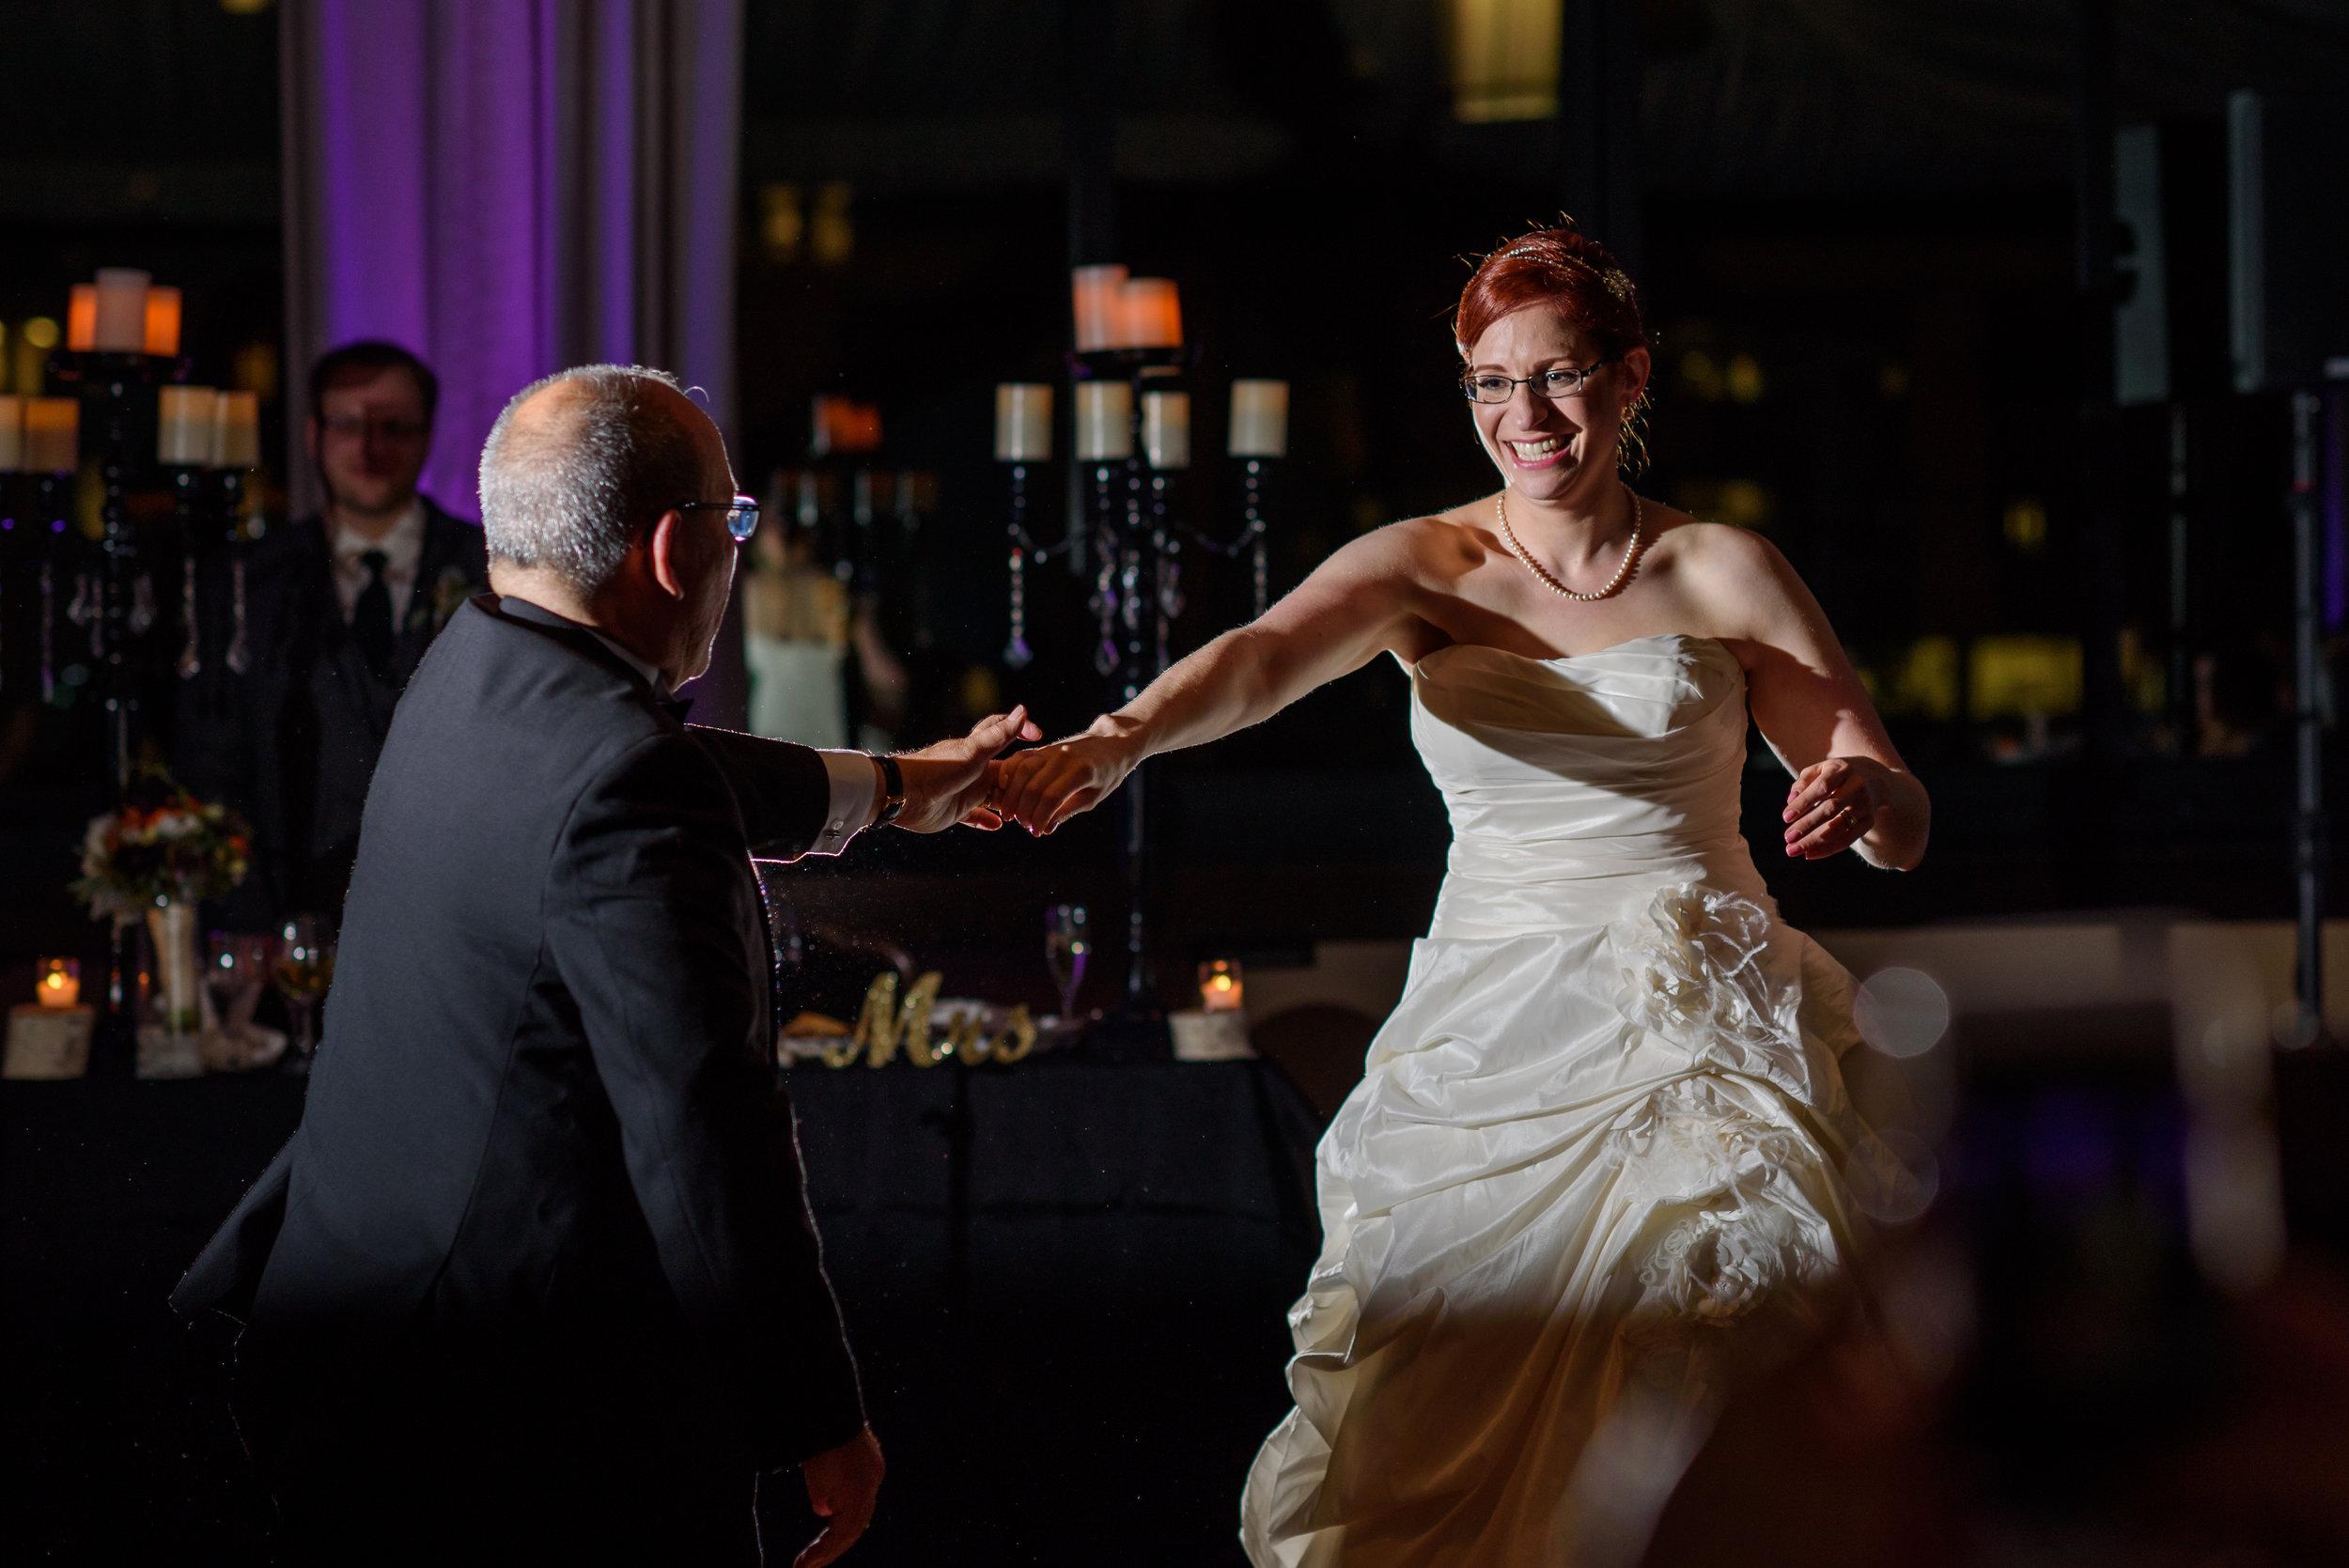 judith-john-014-citizen-hotel-sacramento-wedding-photographer-katherine-nicole-photography.JPG